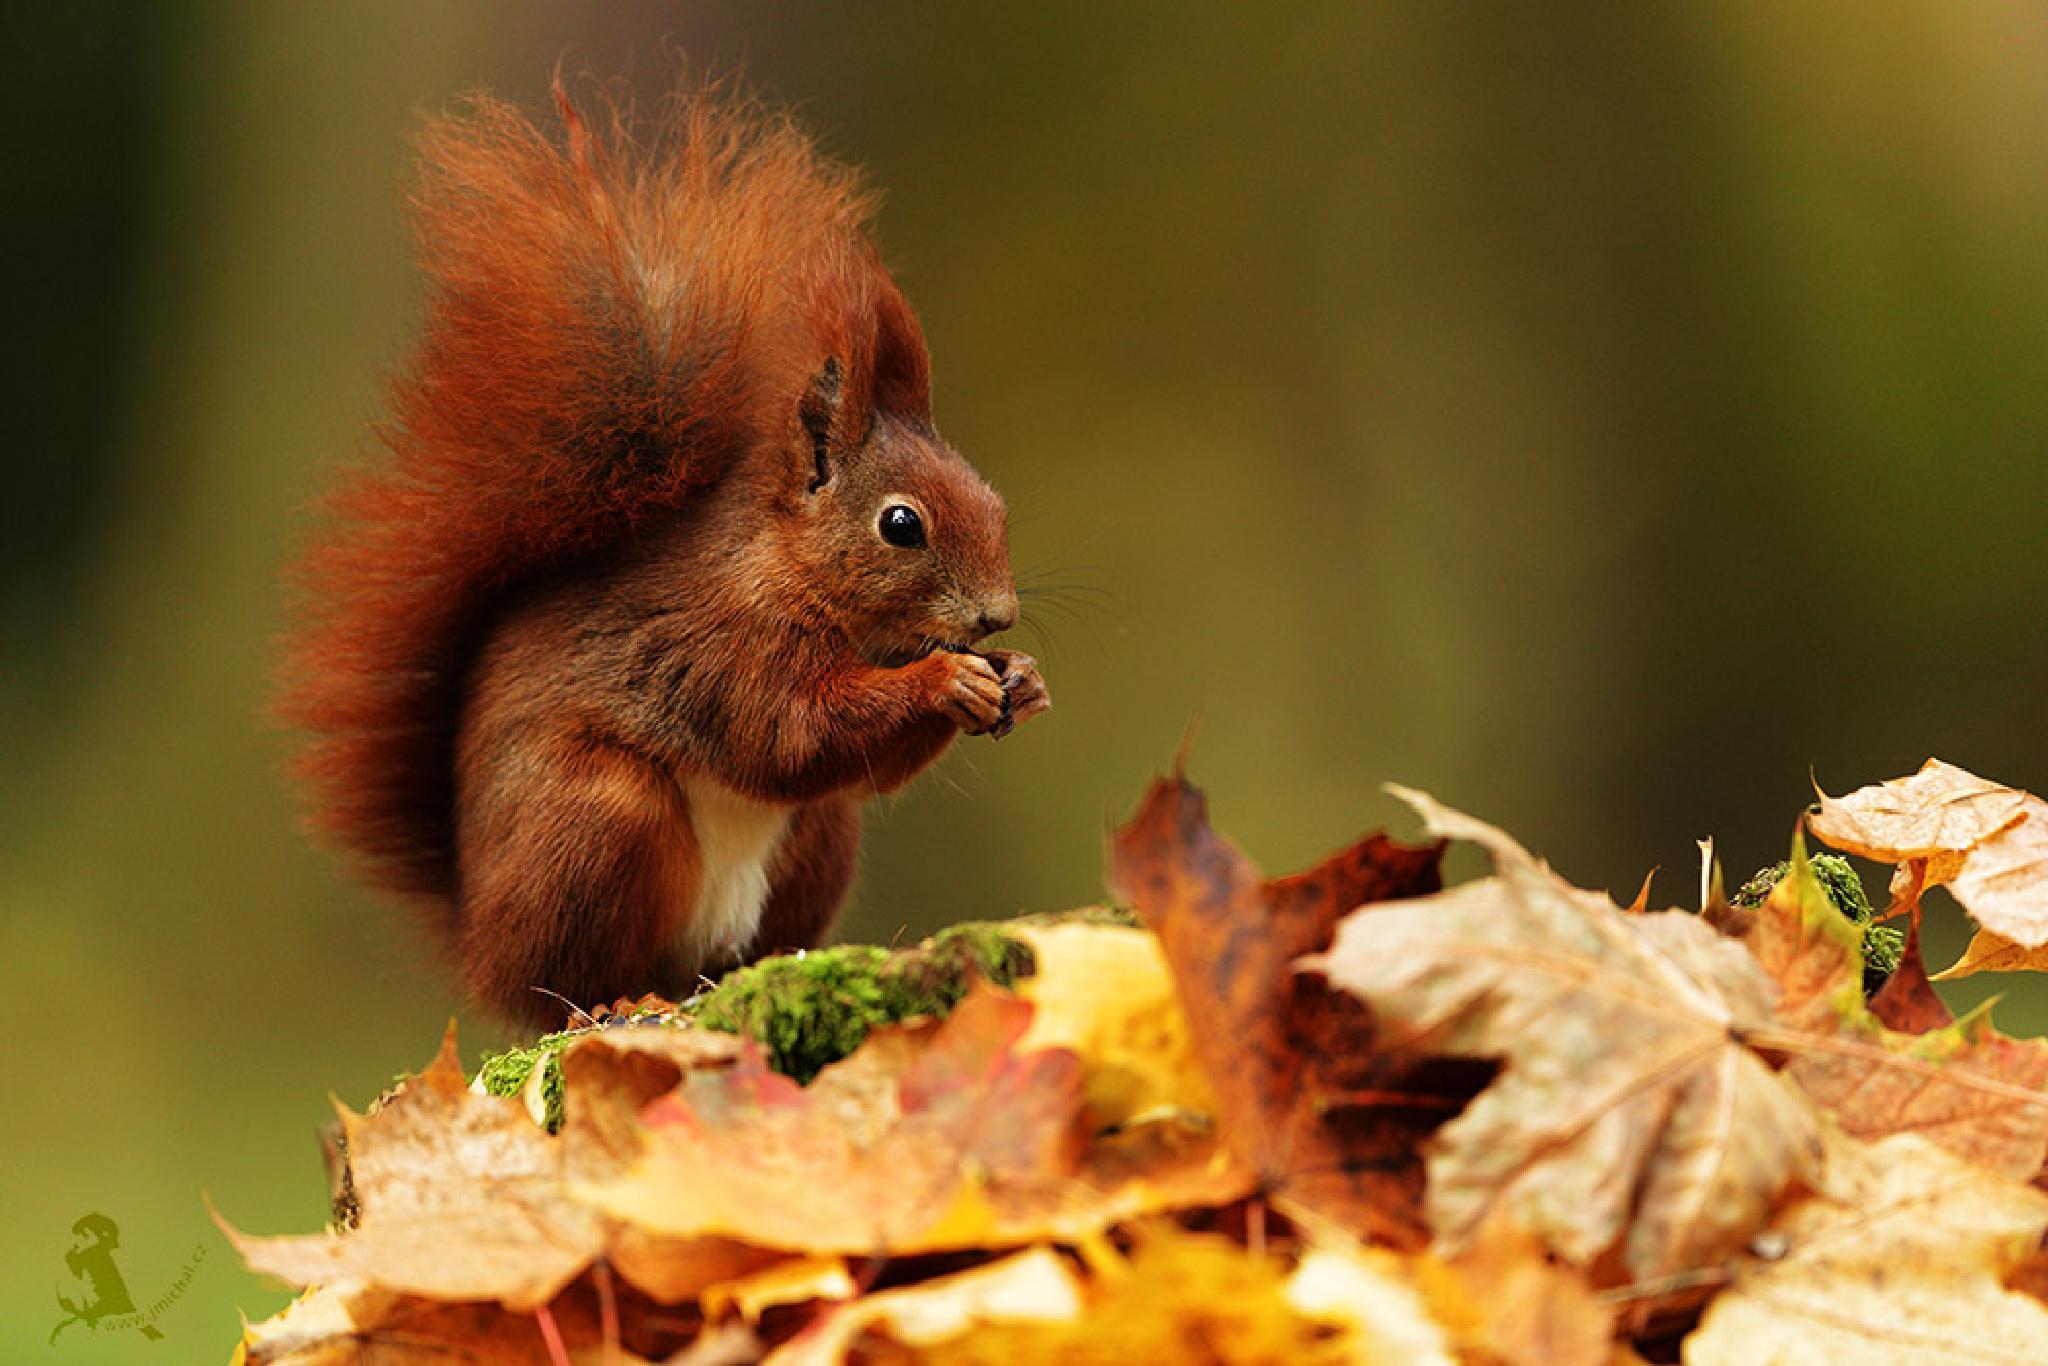 Red squirrel by MichalJiri